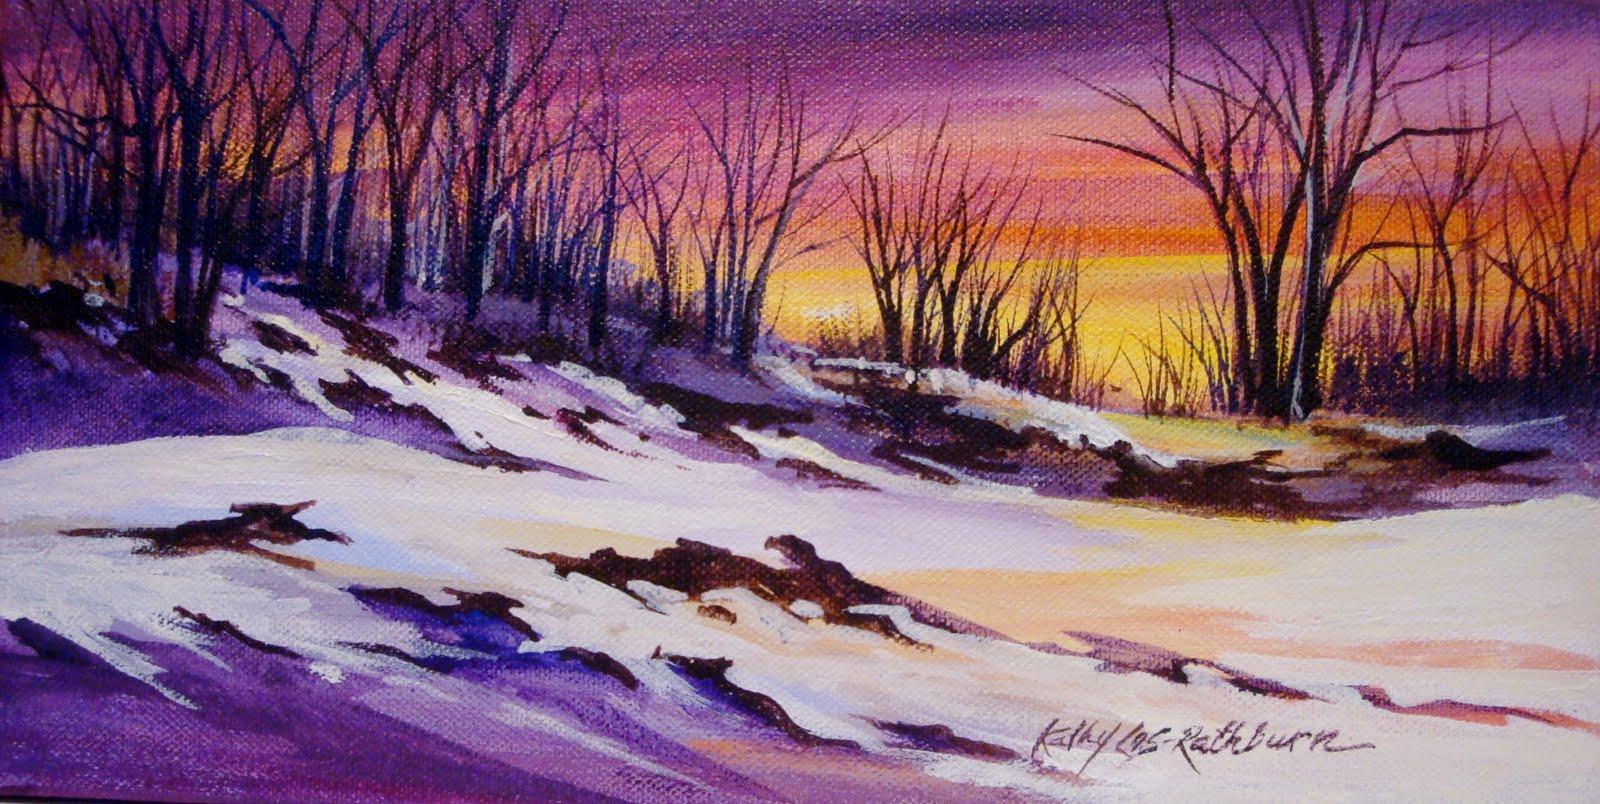 """Sunset Dunes"" original fine art by Kathy Los-Rathburn"